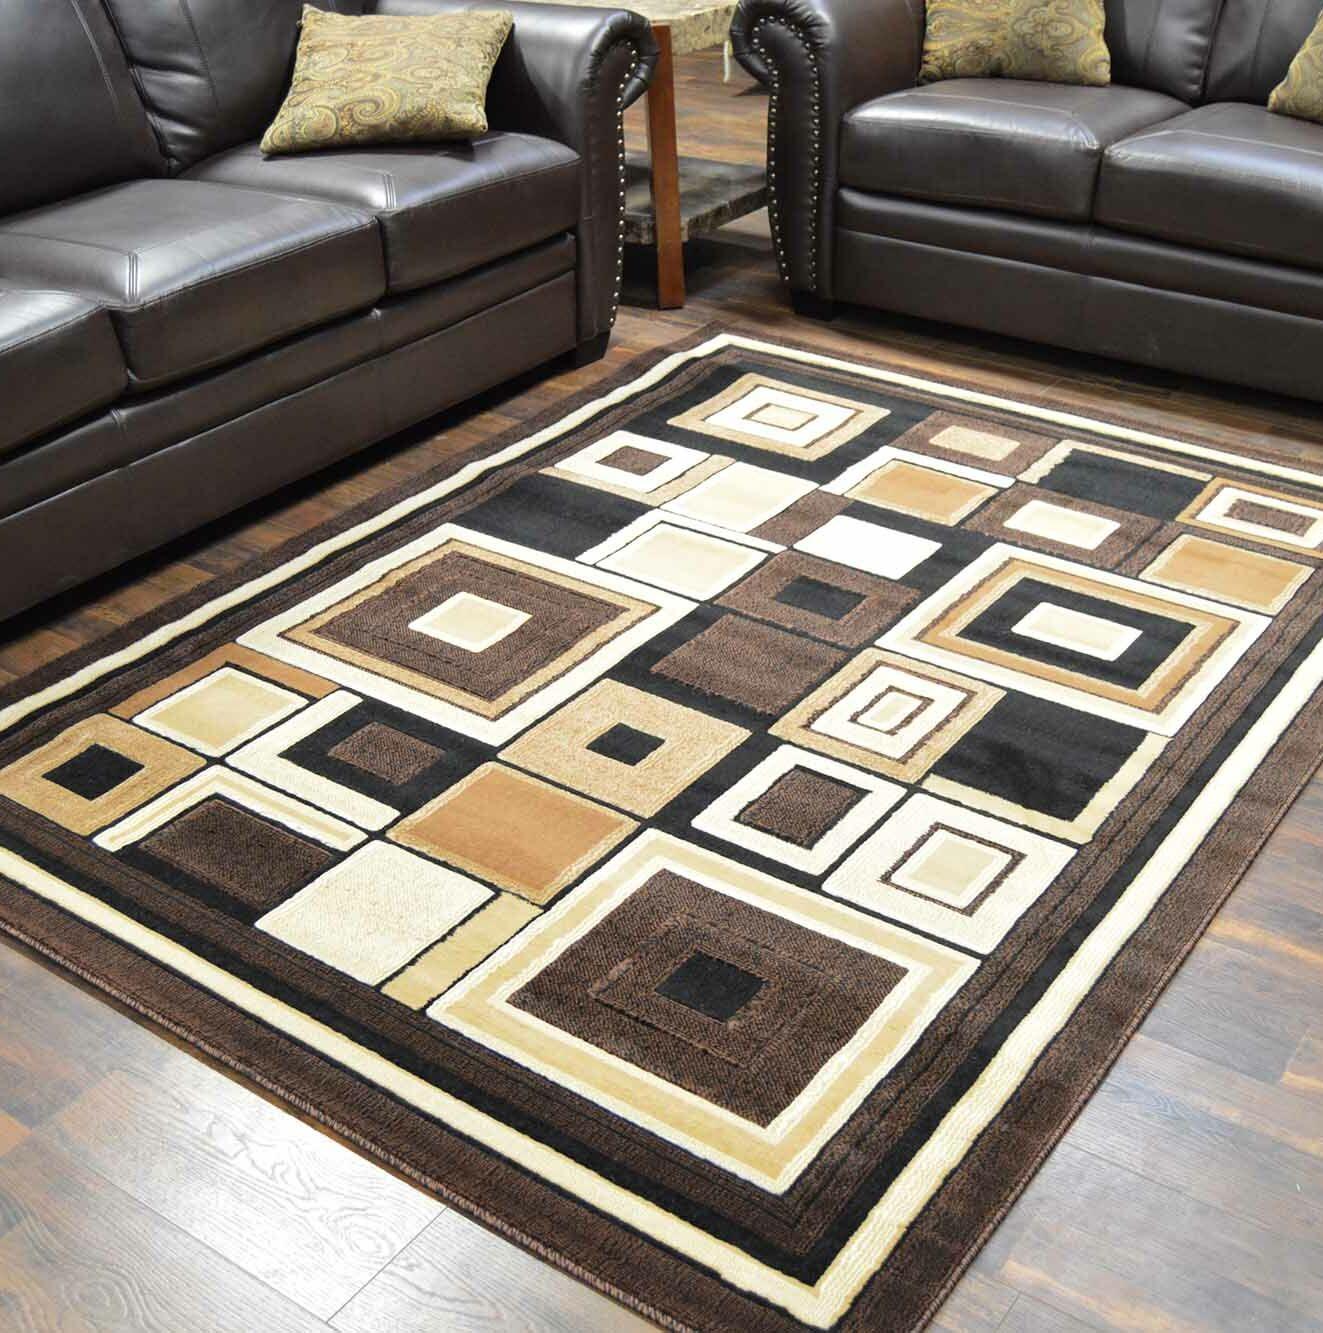 Cosper Brown/Beige Area Rug Rug Size: Rectangle 8' x 10'5